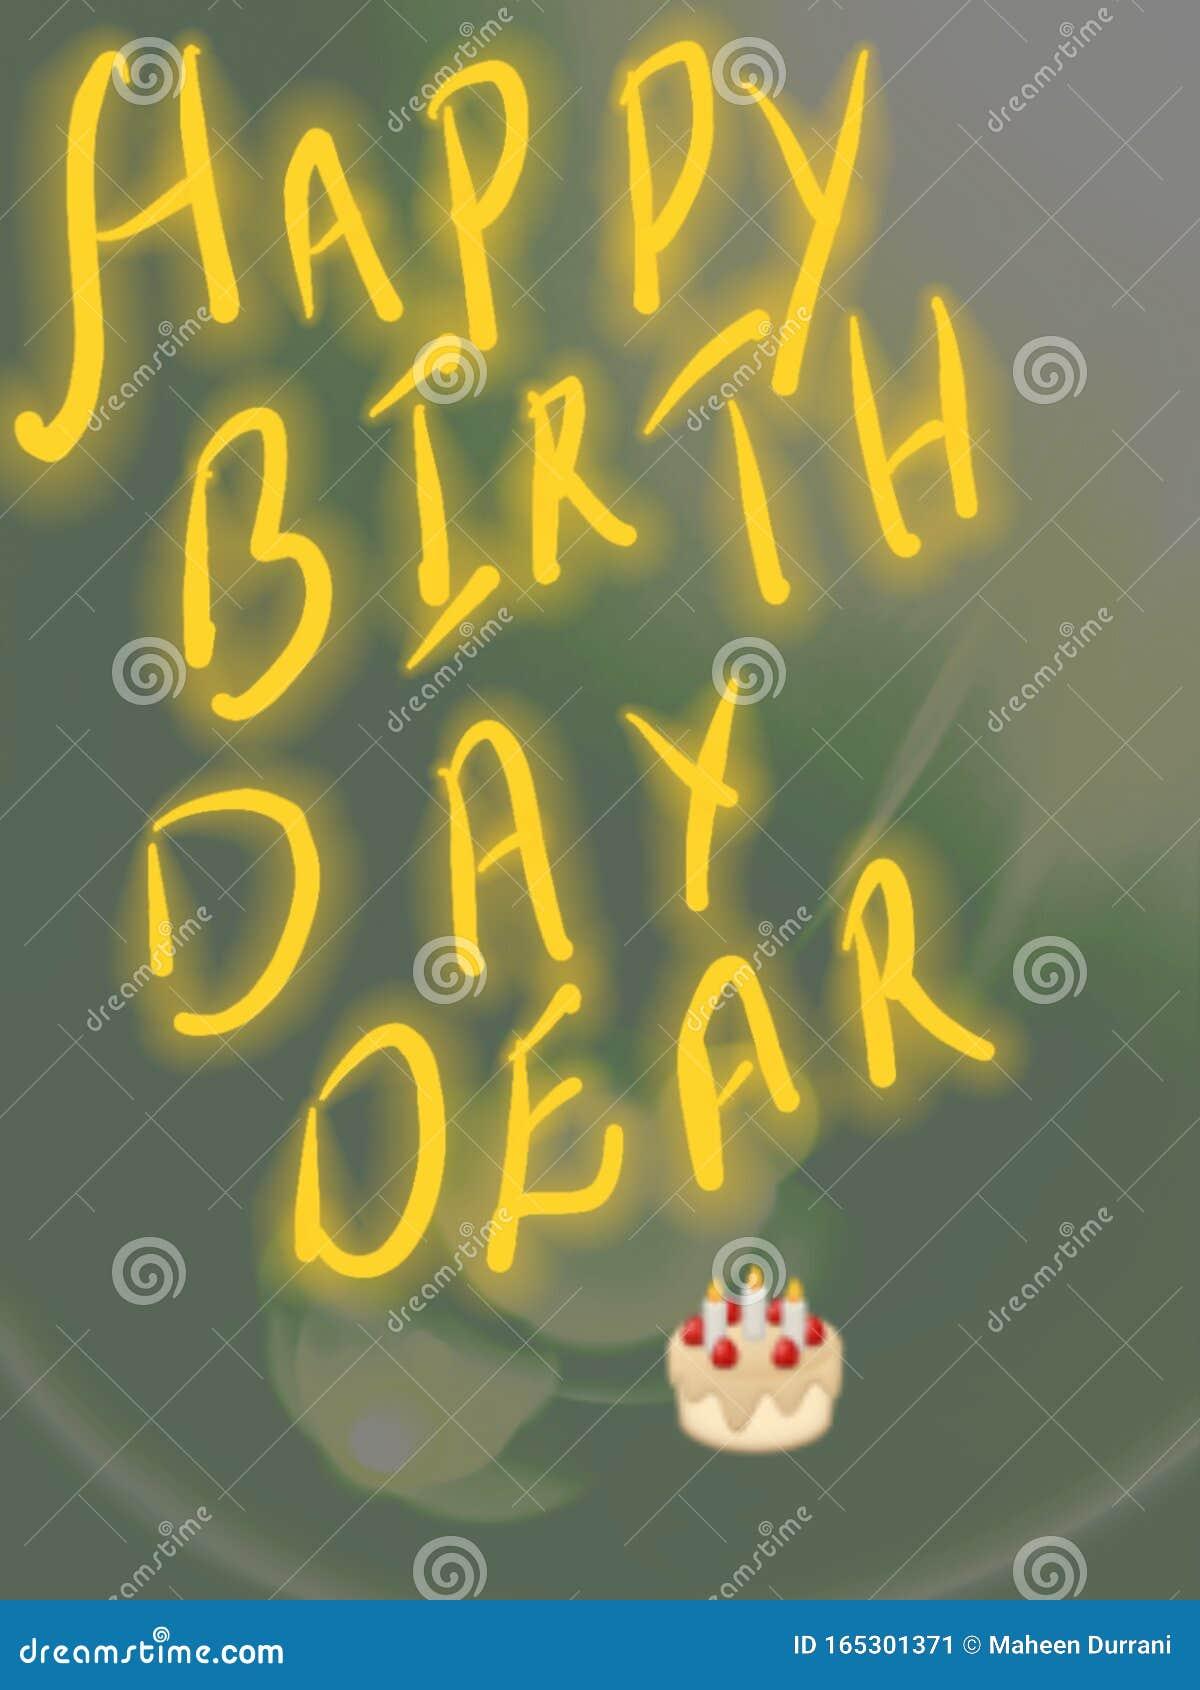 Happy birthday wish to dear once